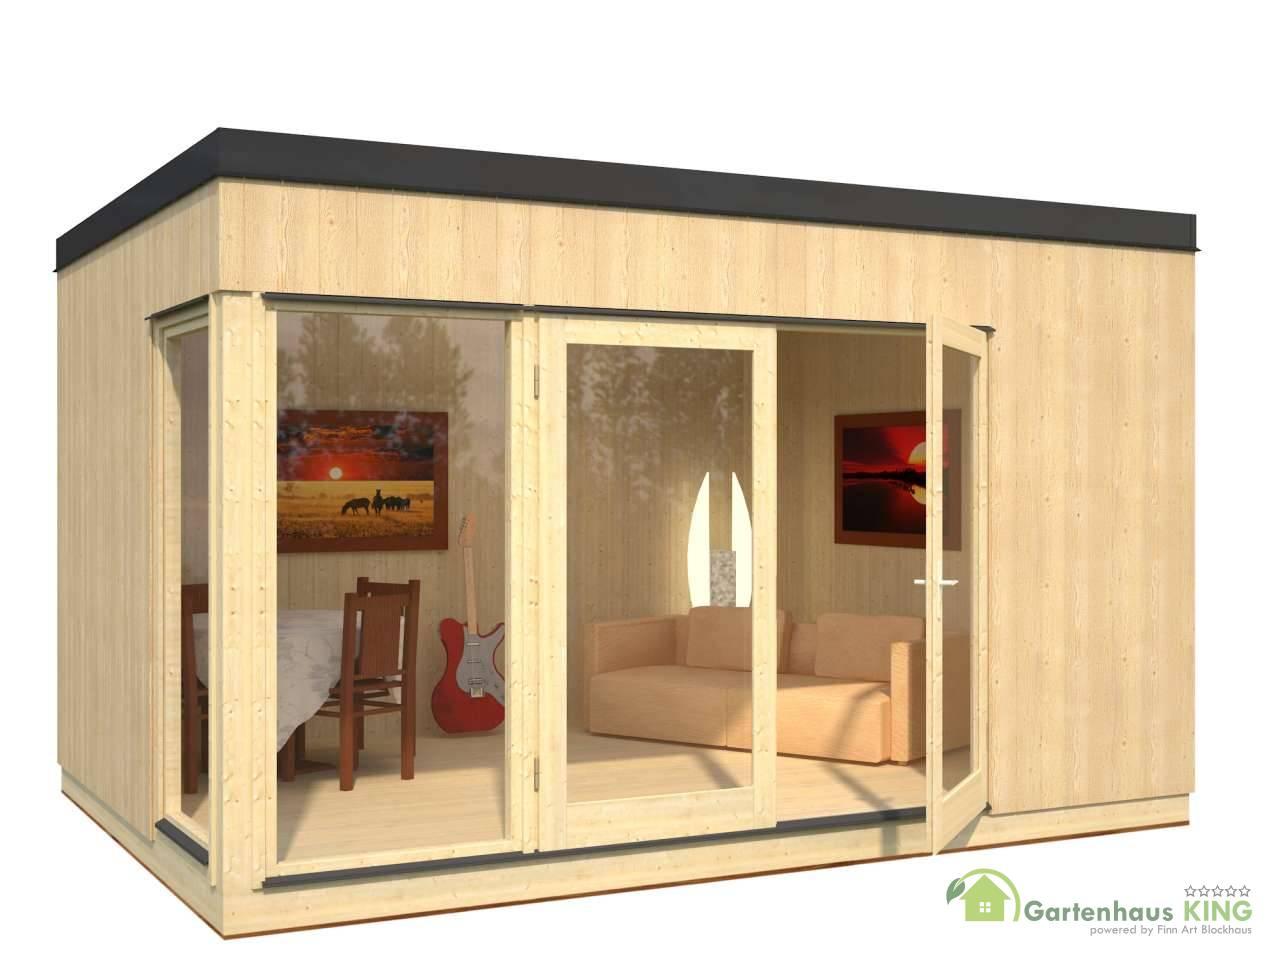 Pultdach gartenhaus palmako solveig 13 6 m gartenhaus for Casetas aluminio para terrazas